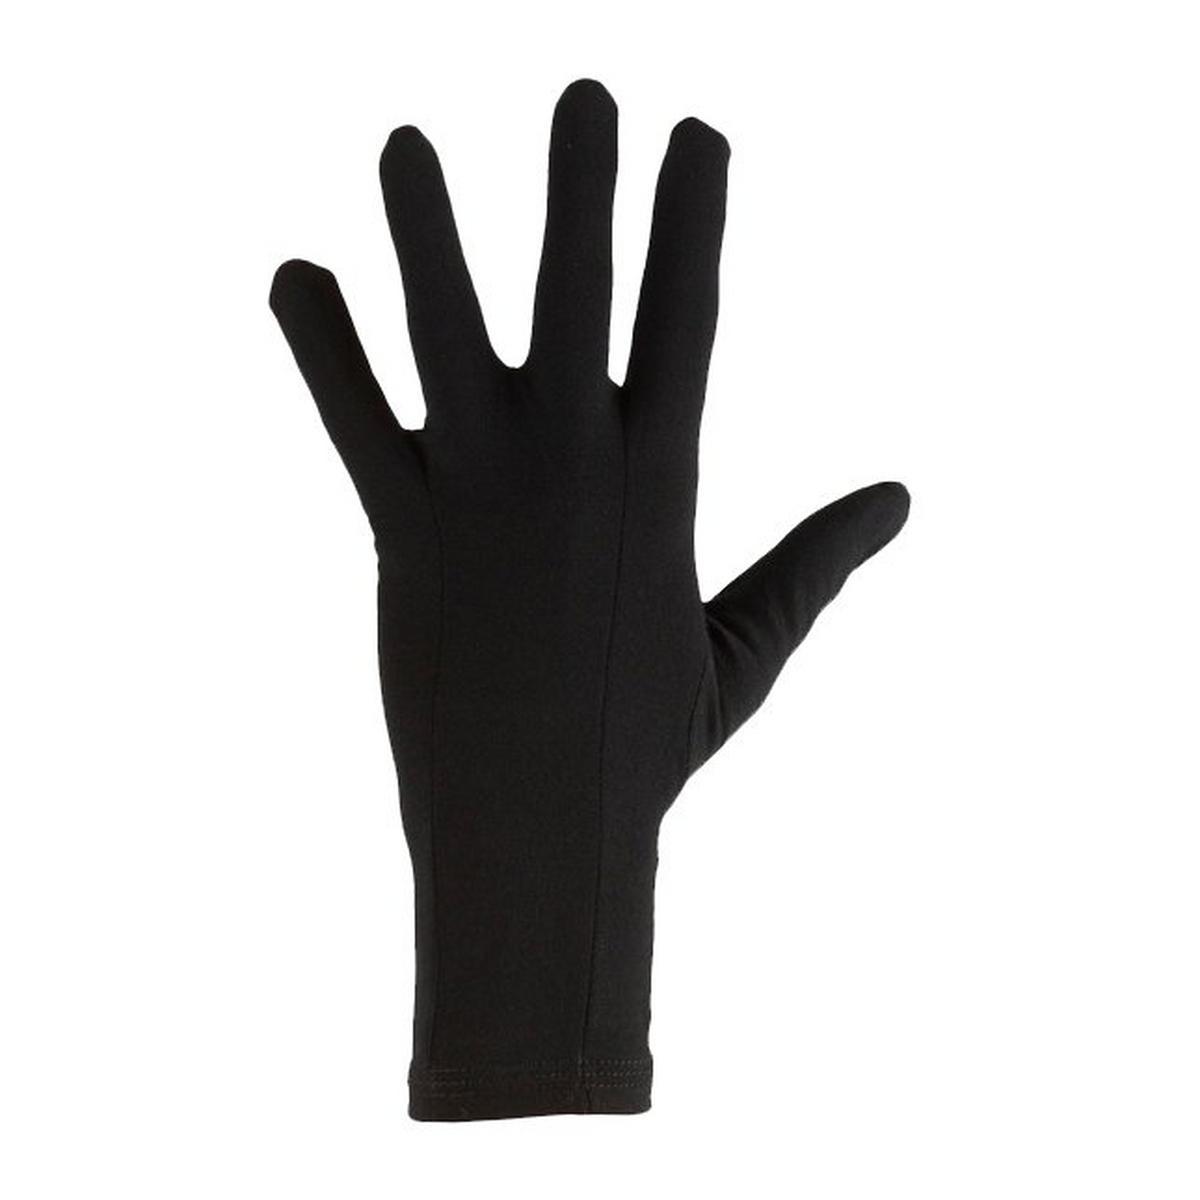 Icebreaker Unisex Icebreaker Oasis Glove Liner - Black